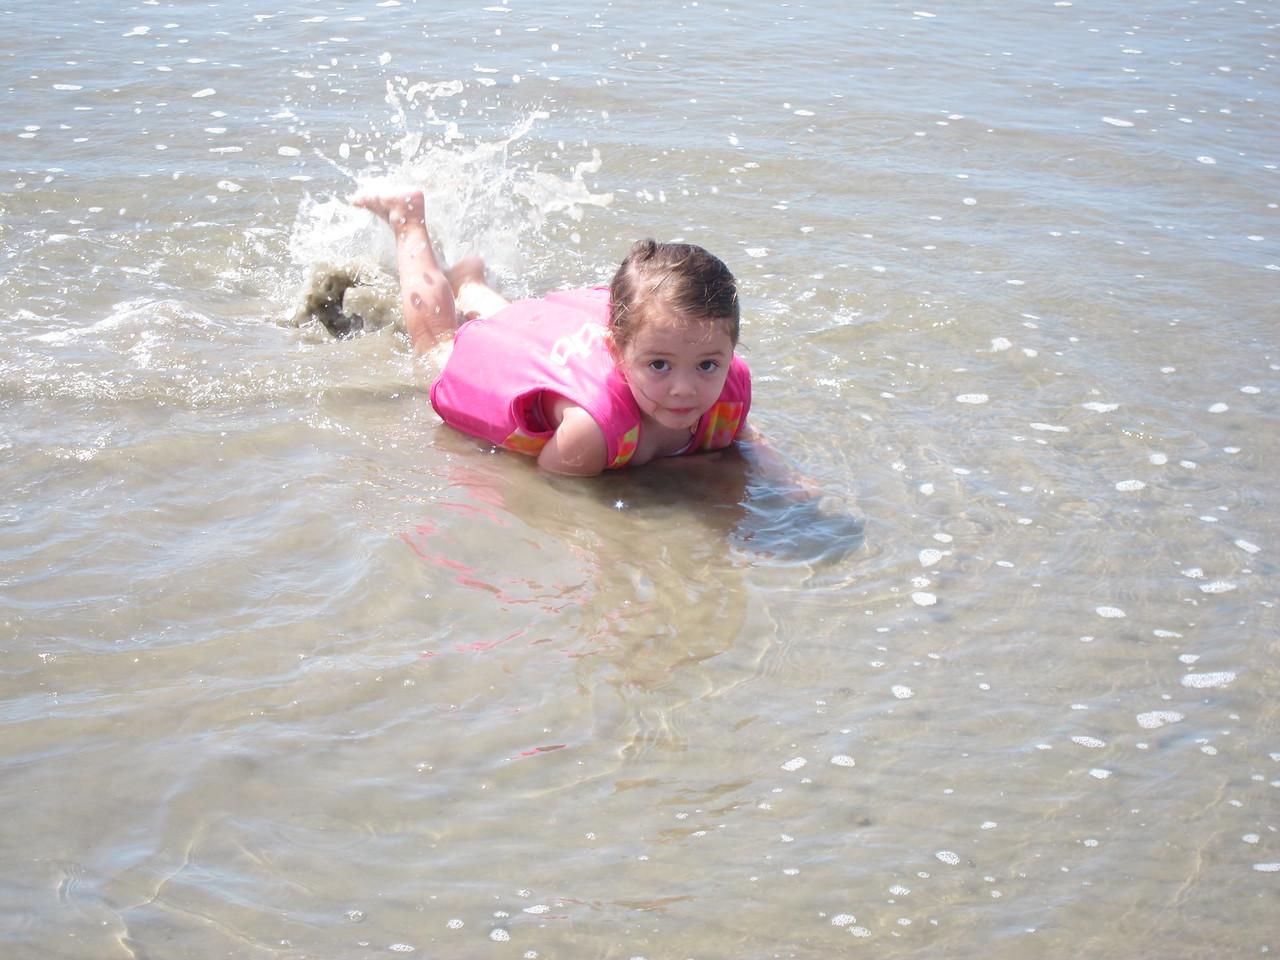 Georgia splashes in the surf